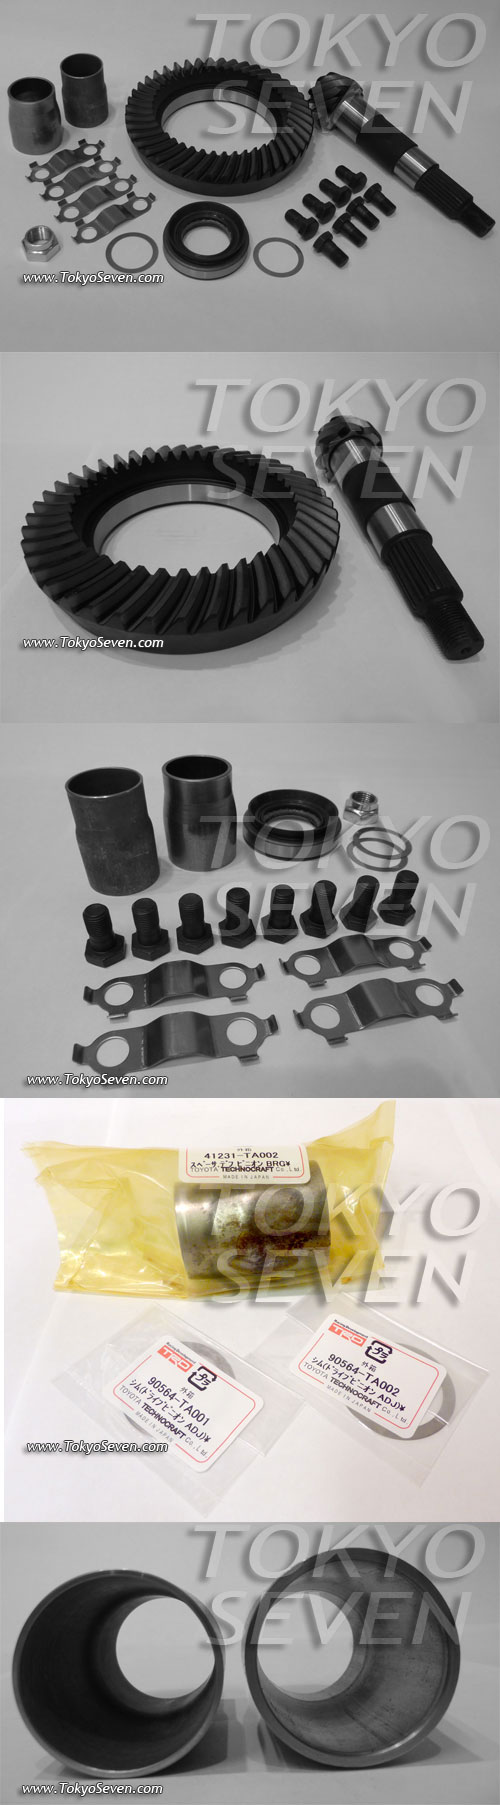 [Image: AEU86 AE86 - AE86 5.375 Final Gears - TRD]